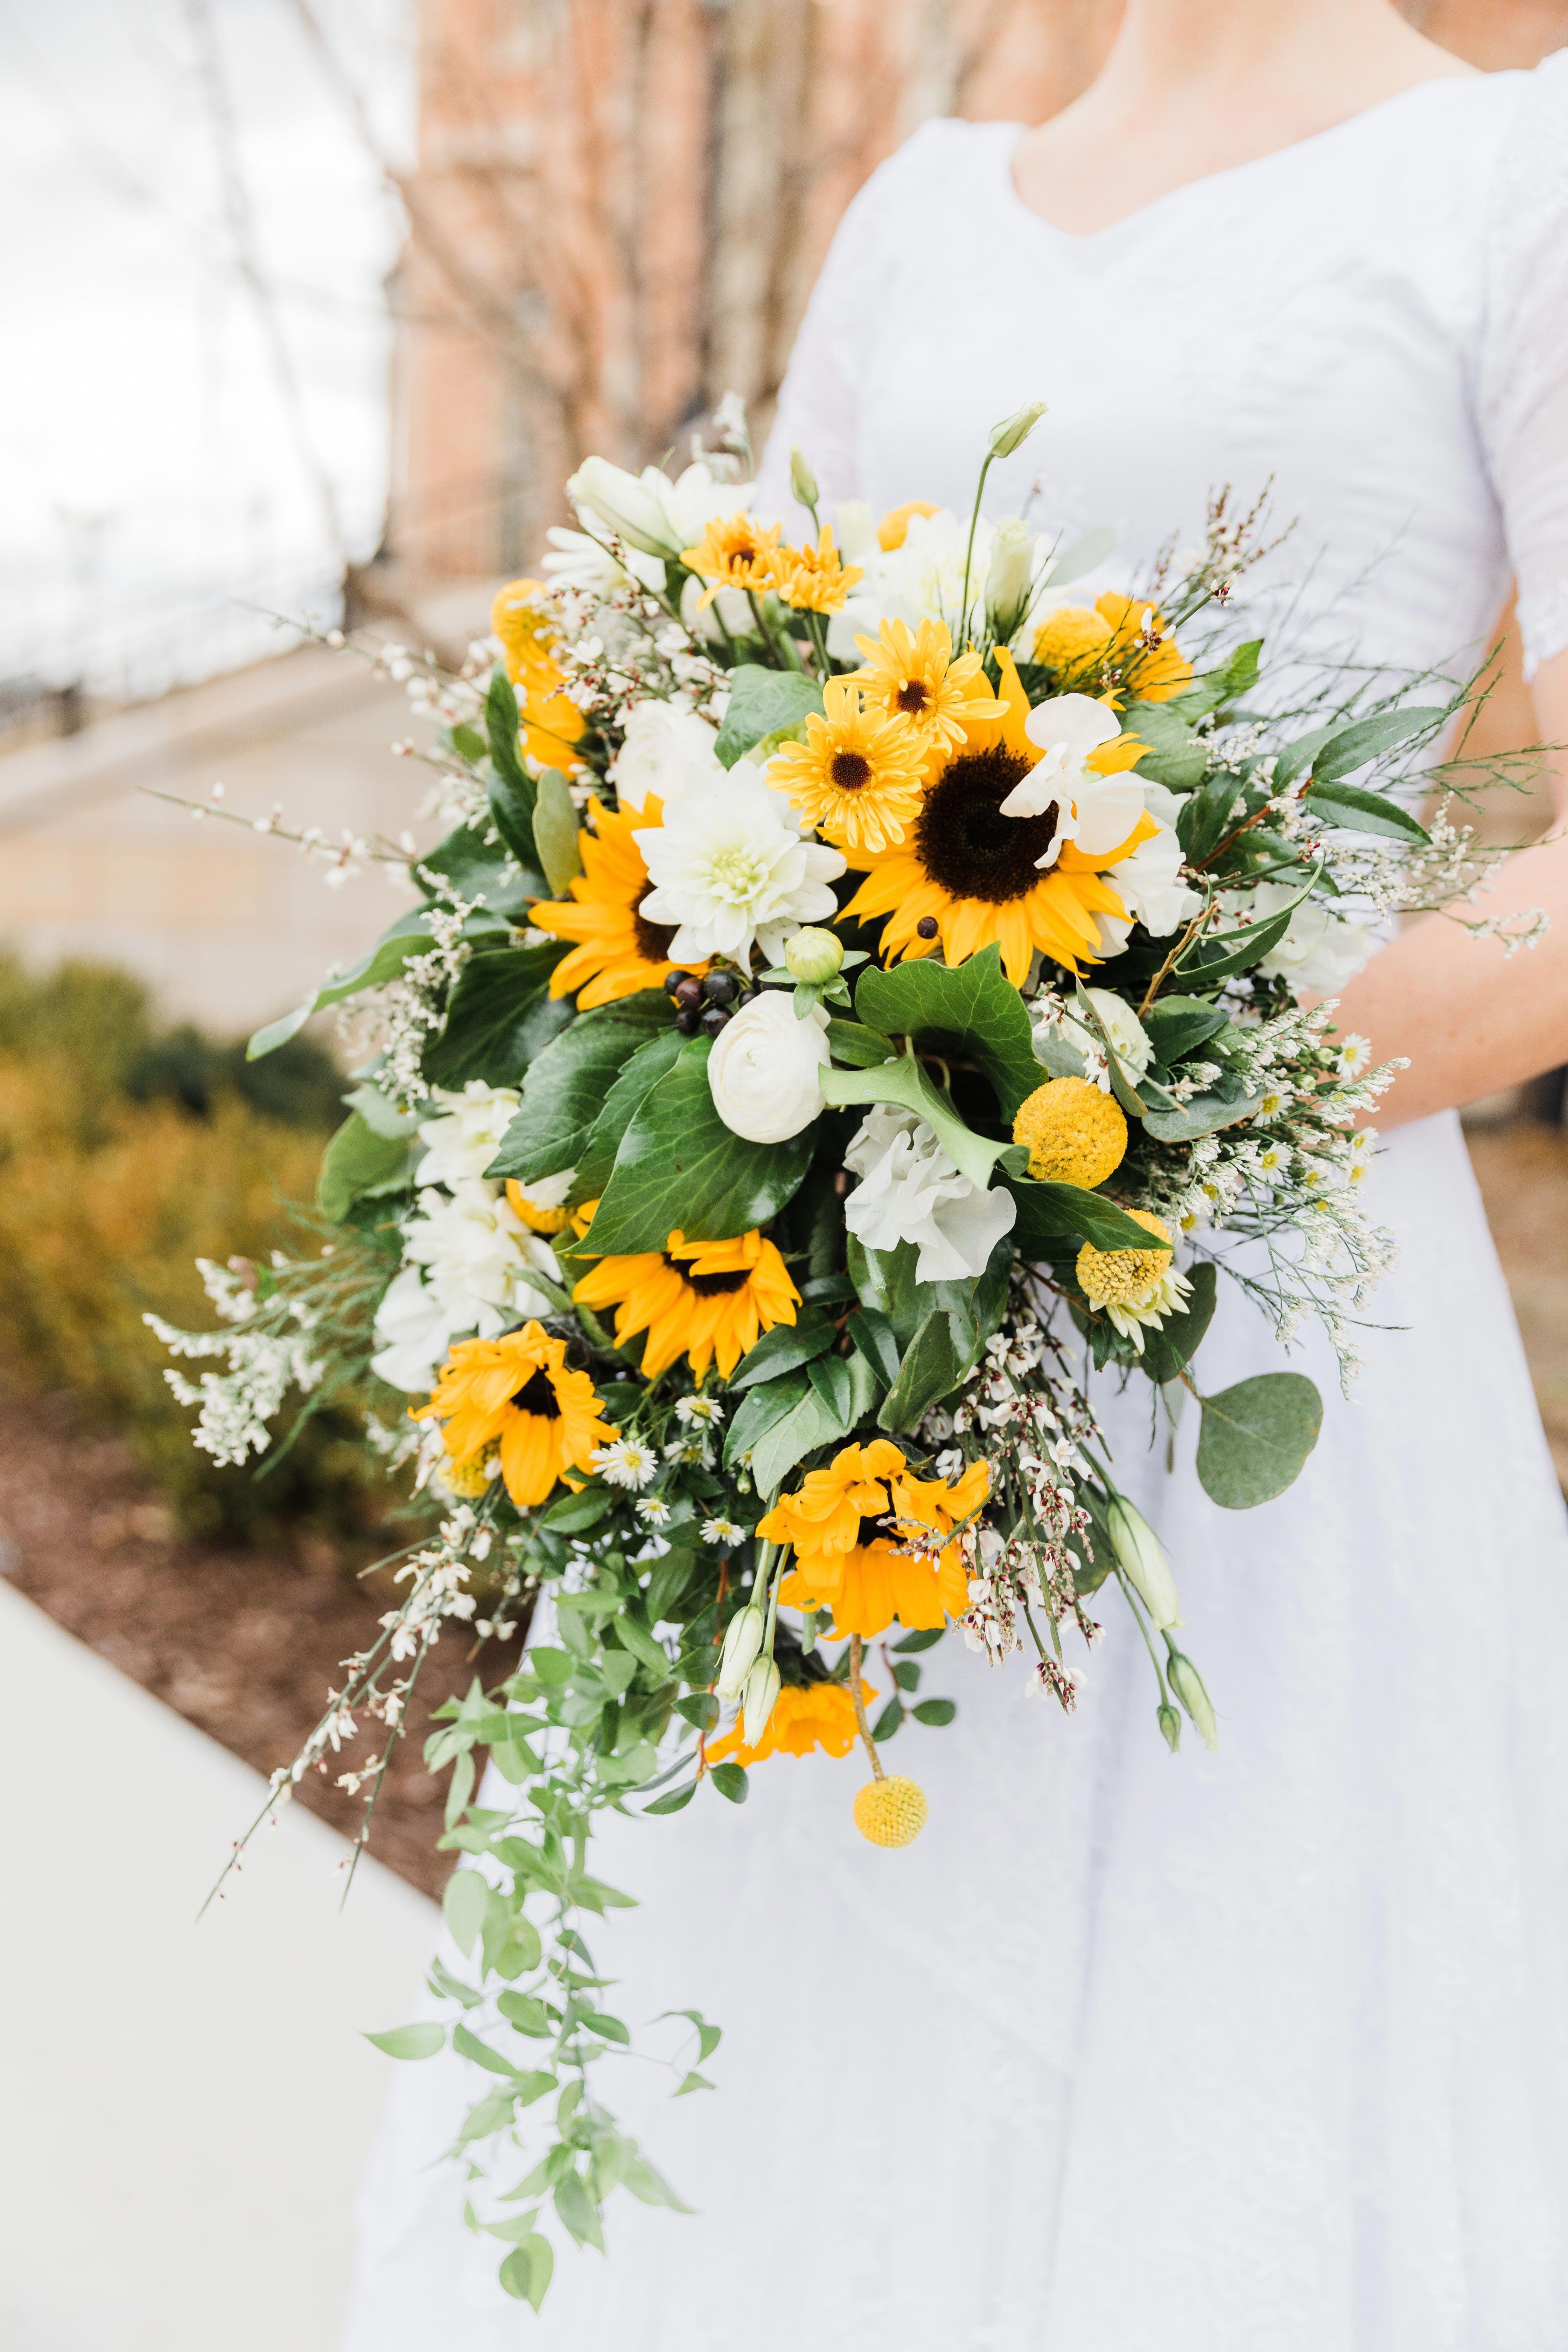 Photography by Tasha Rose, summer wedding, spring wedding